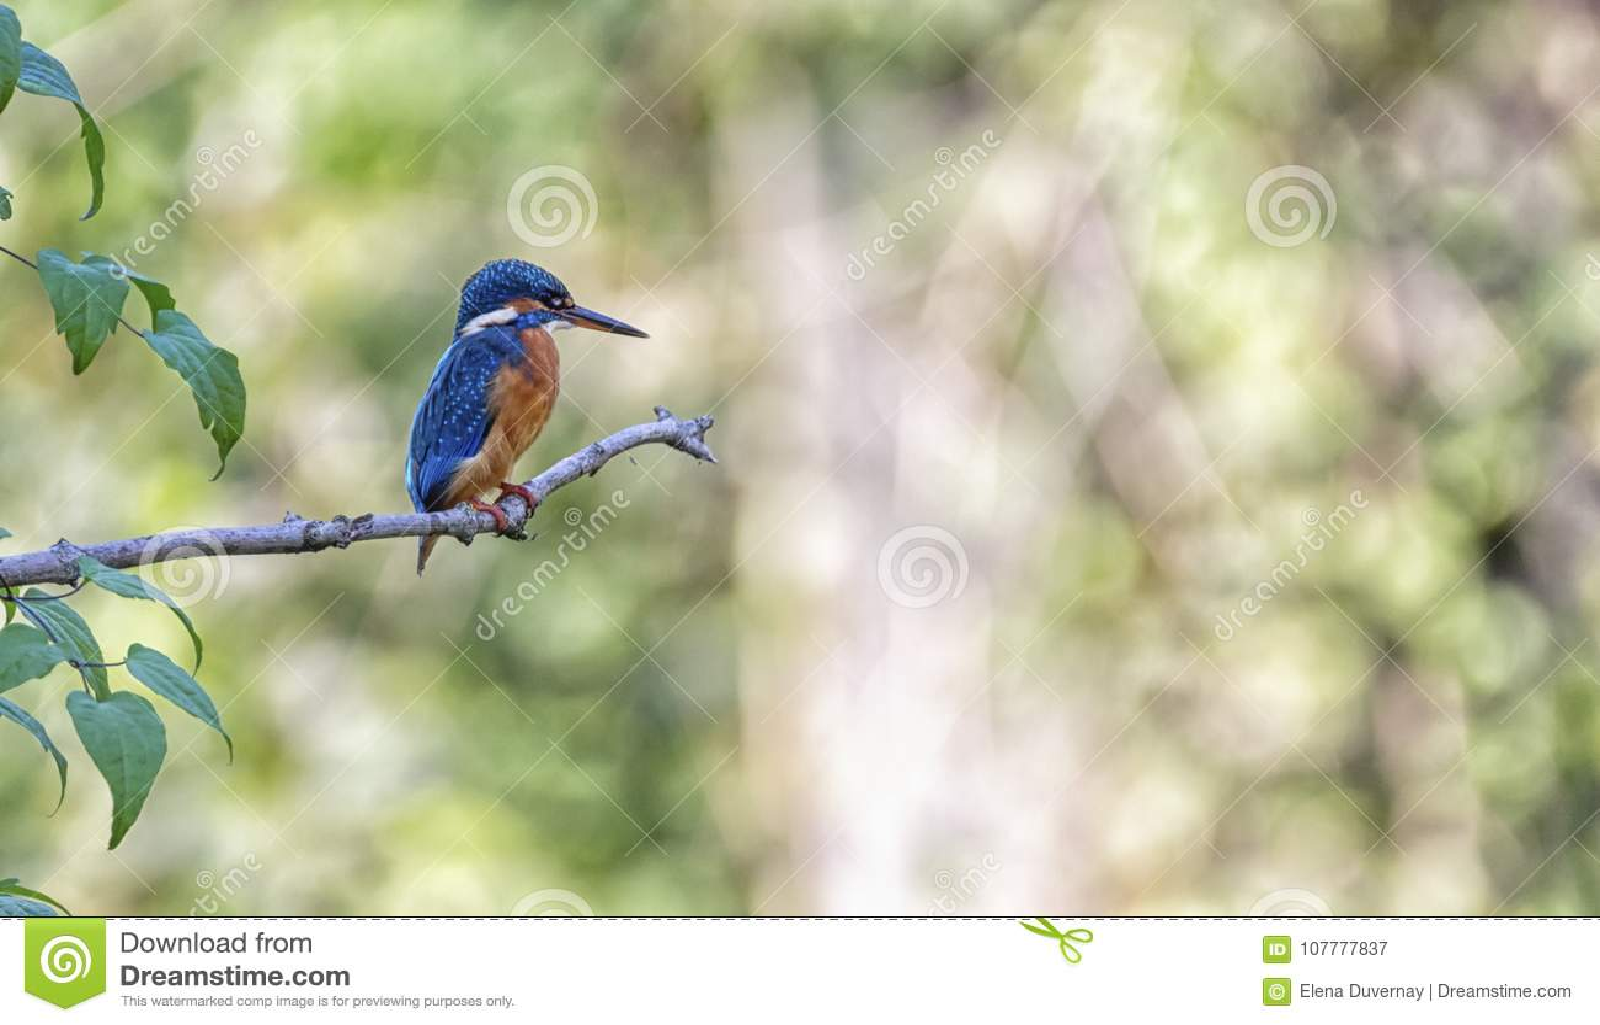 Eurasian, river or common kingfisher, alcedo atthis, Neuchatel, Switzerland